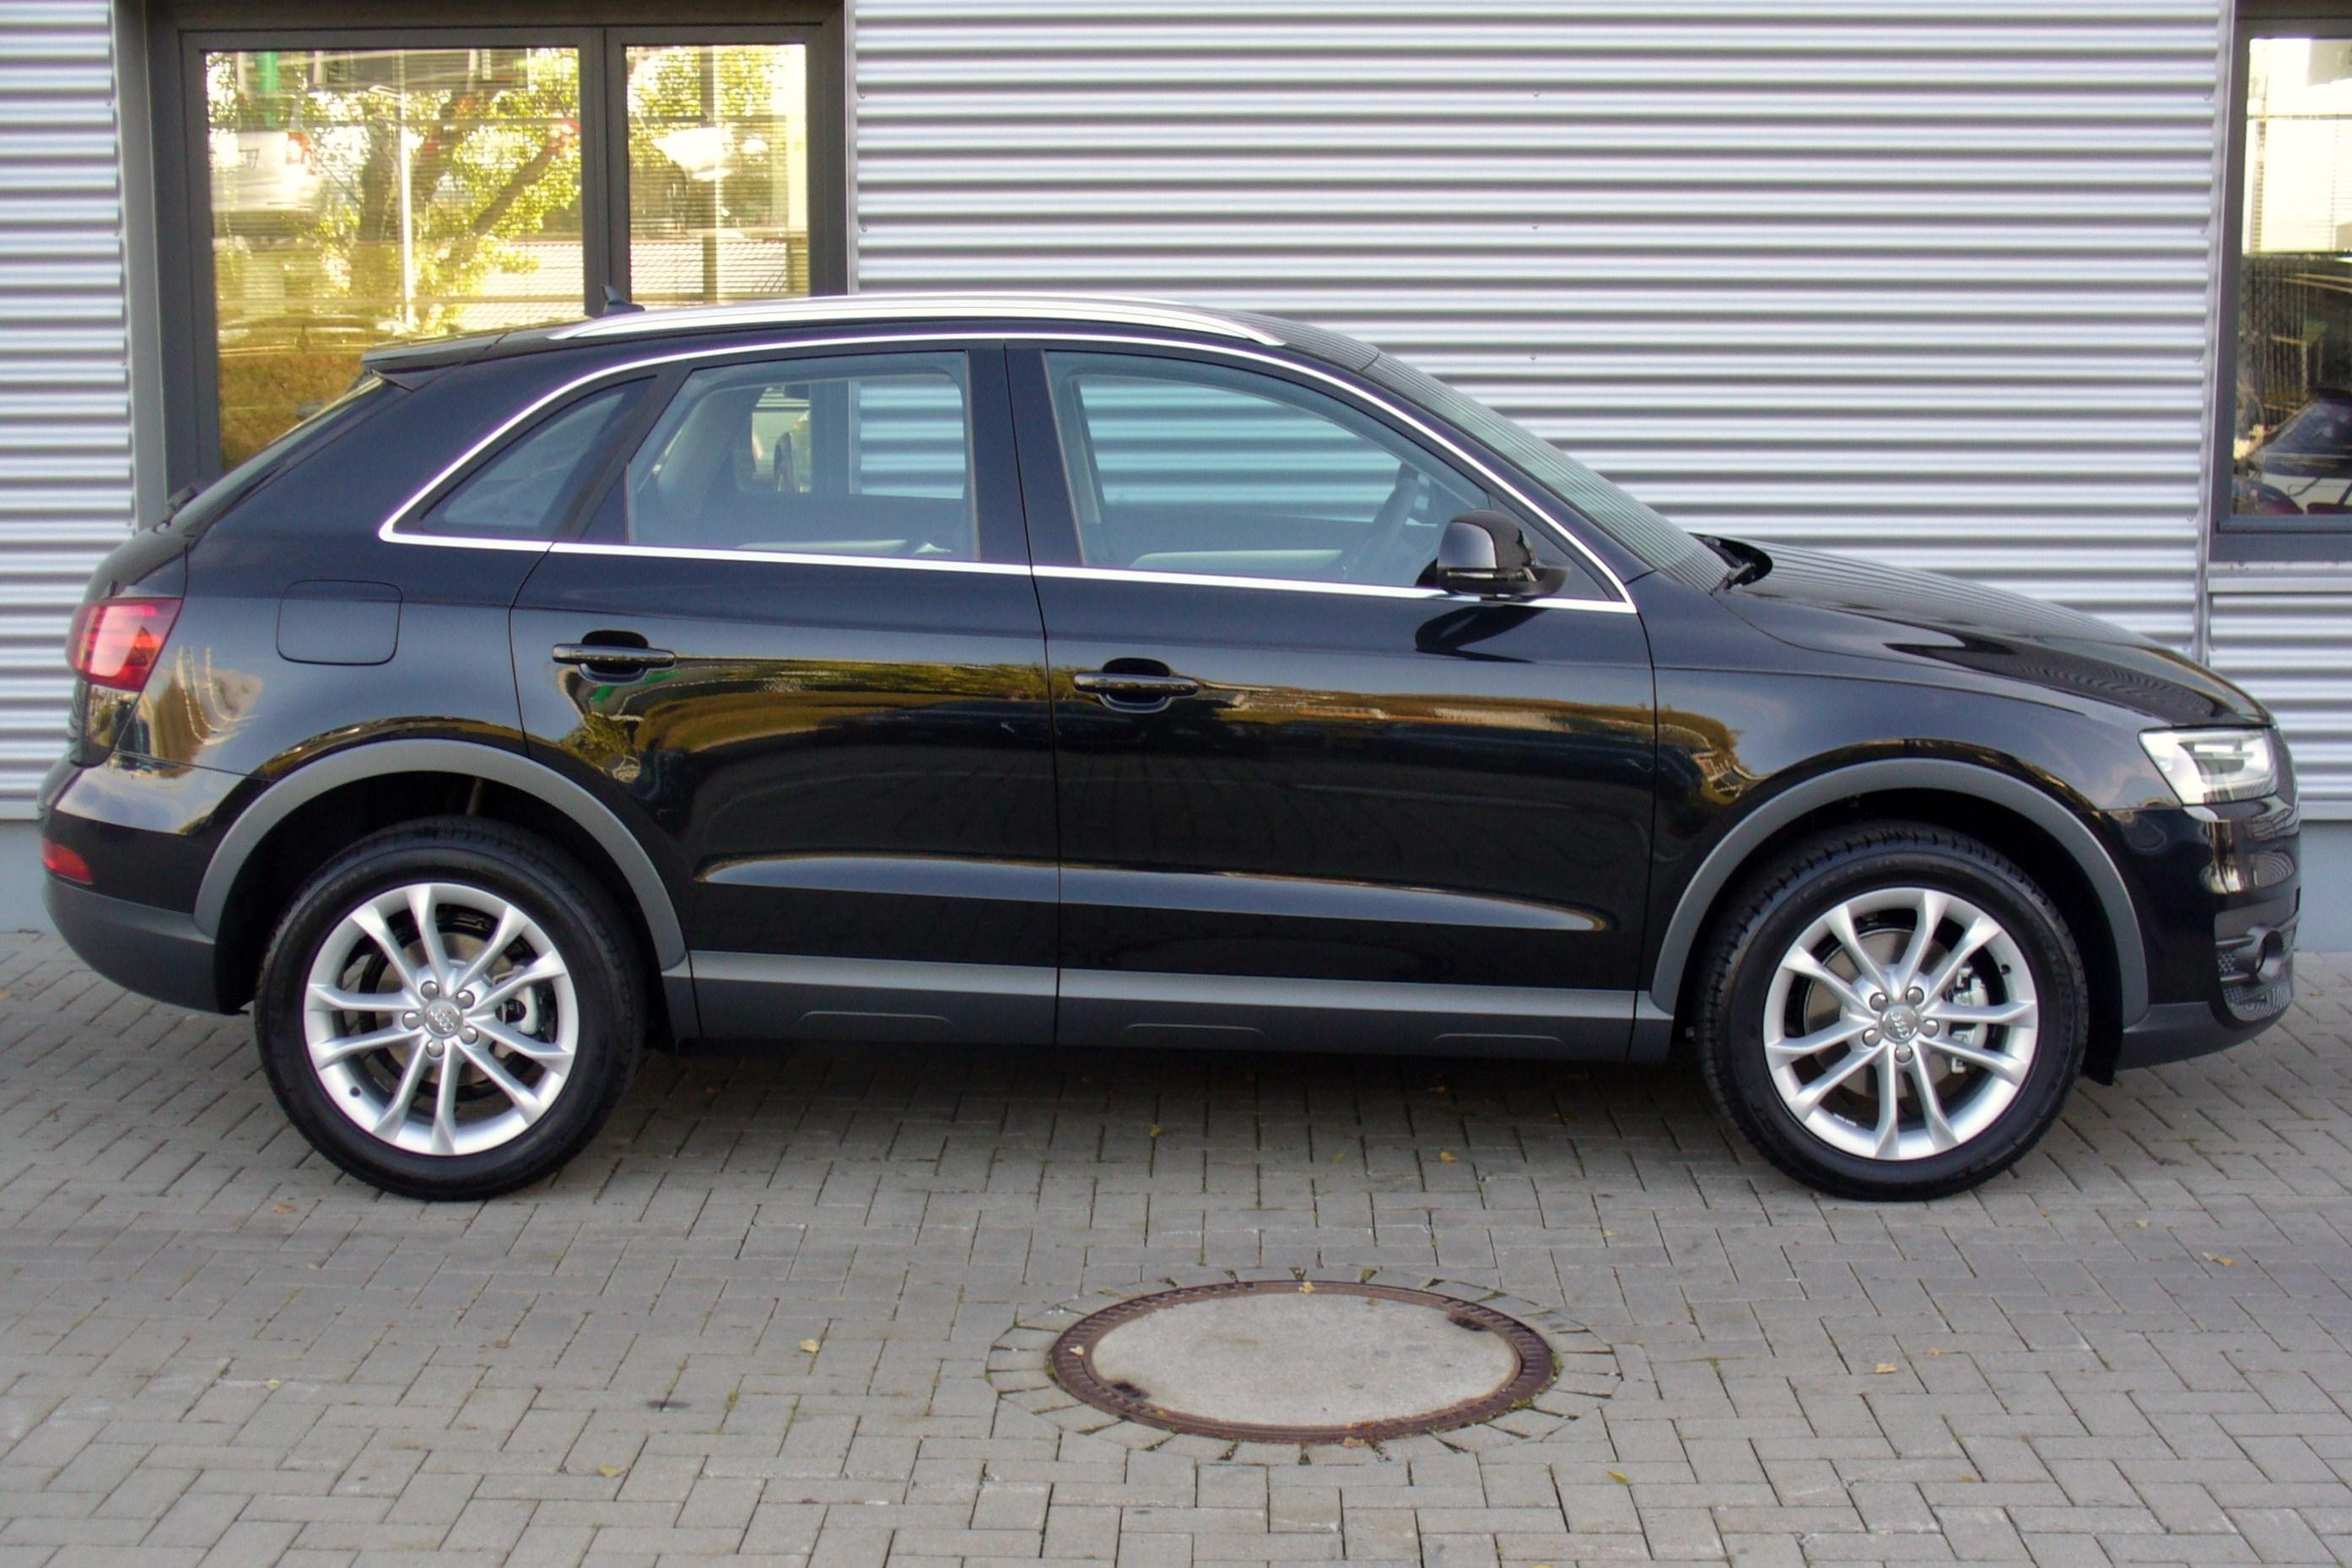 File Audi Q3 2 0 Tdi Quattro S Tronic Phantomschwarz Seite Jpg